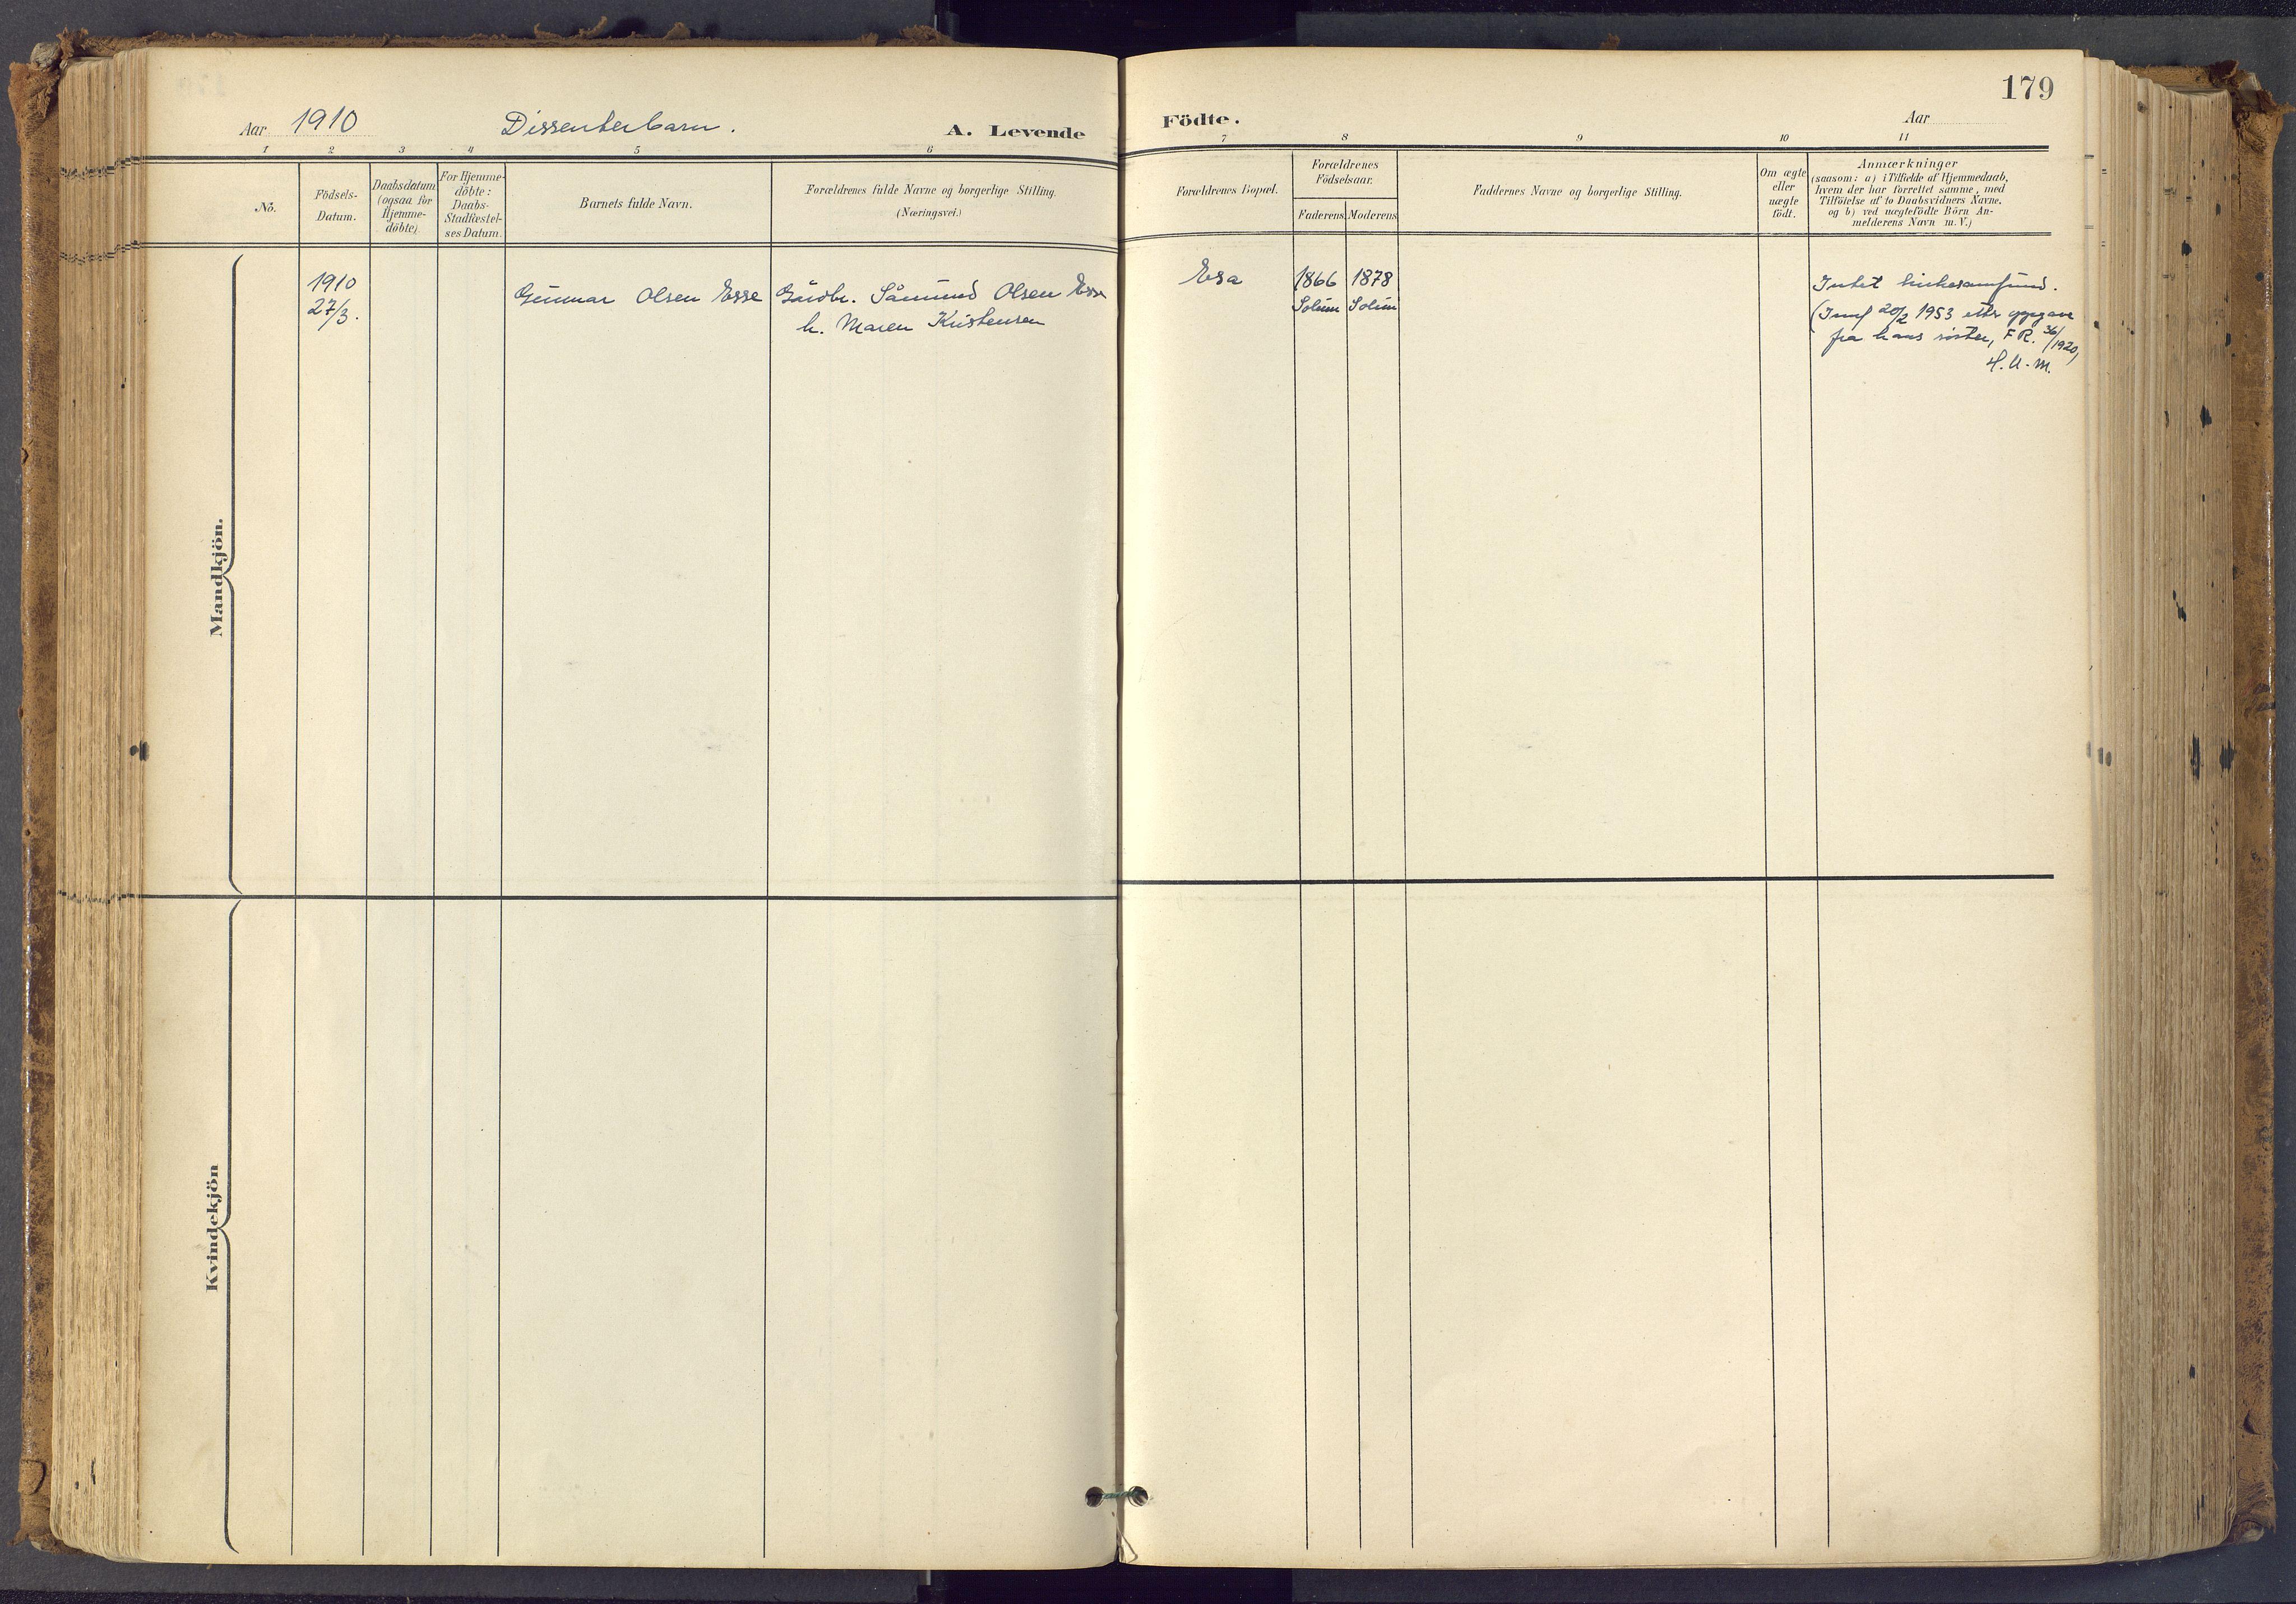 SAKO, Bamble kirkebøker, F/Fa/L0009: Ministerialbok nr. I 9, 1901-1917, s. 179